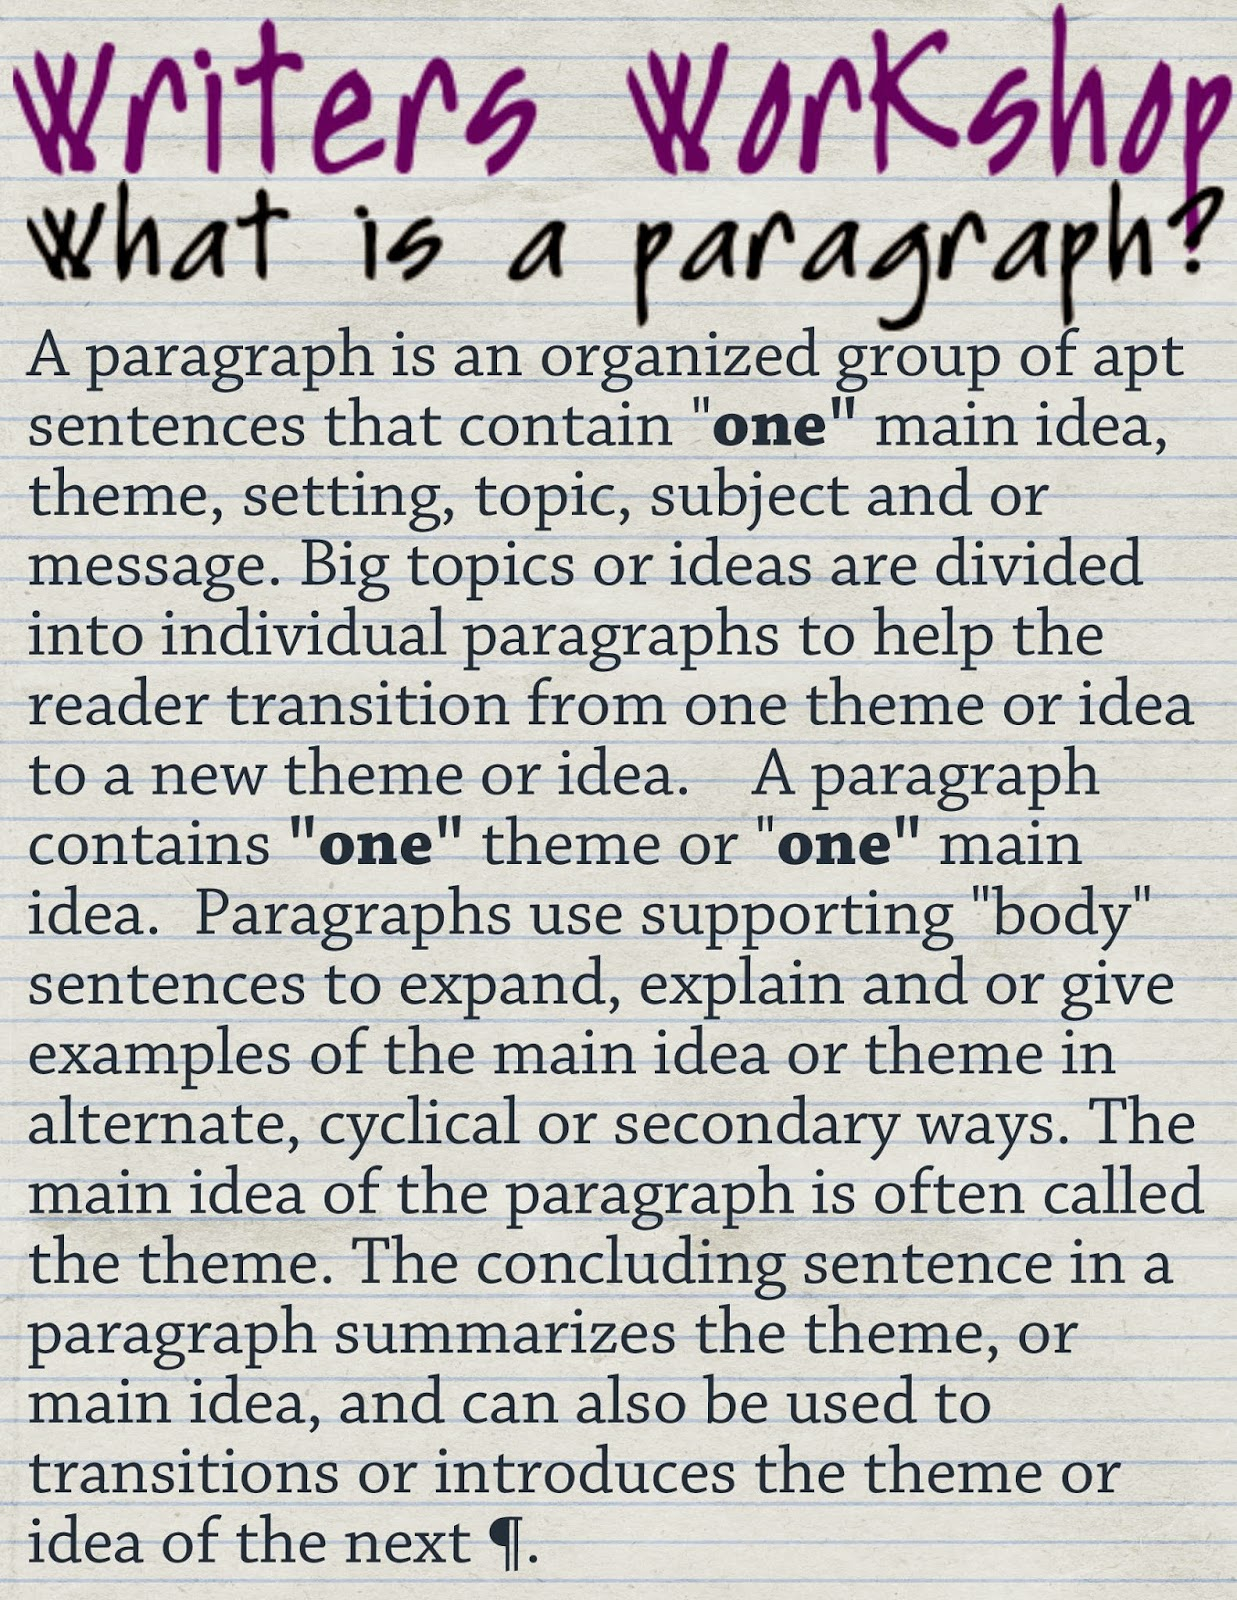 Paraphrase word in sentences